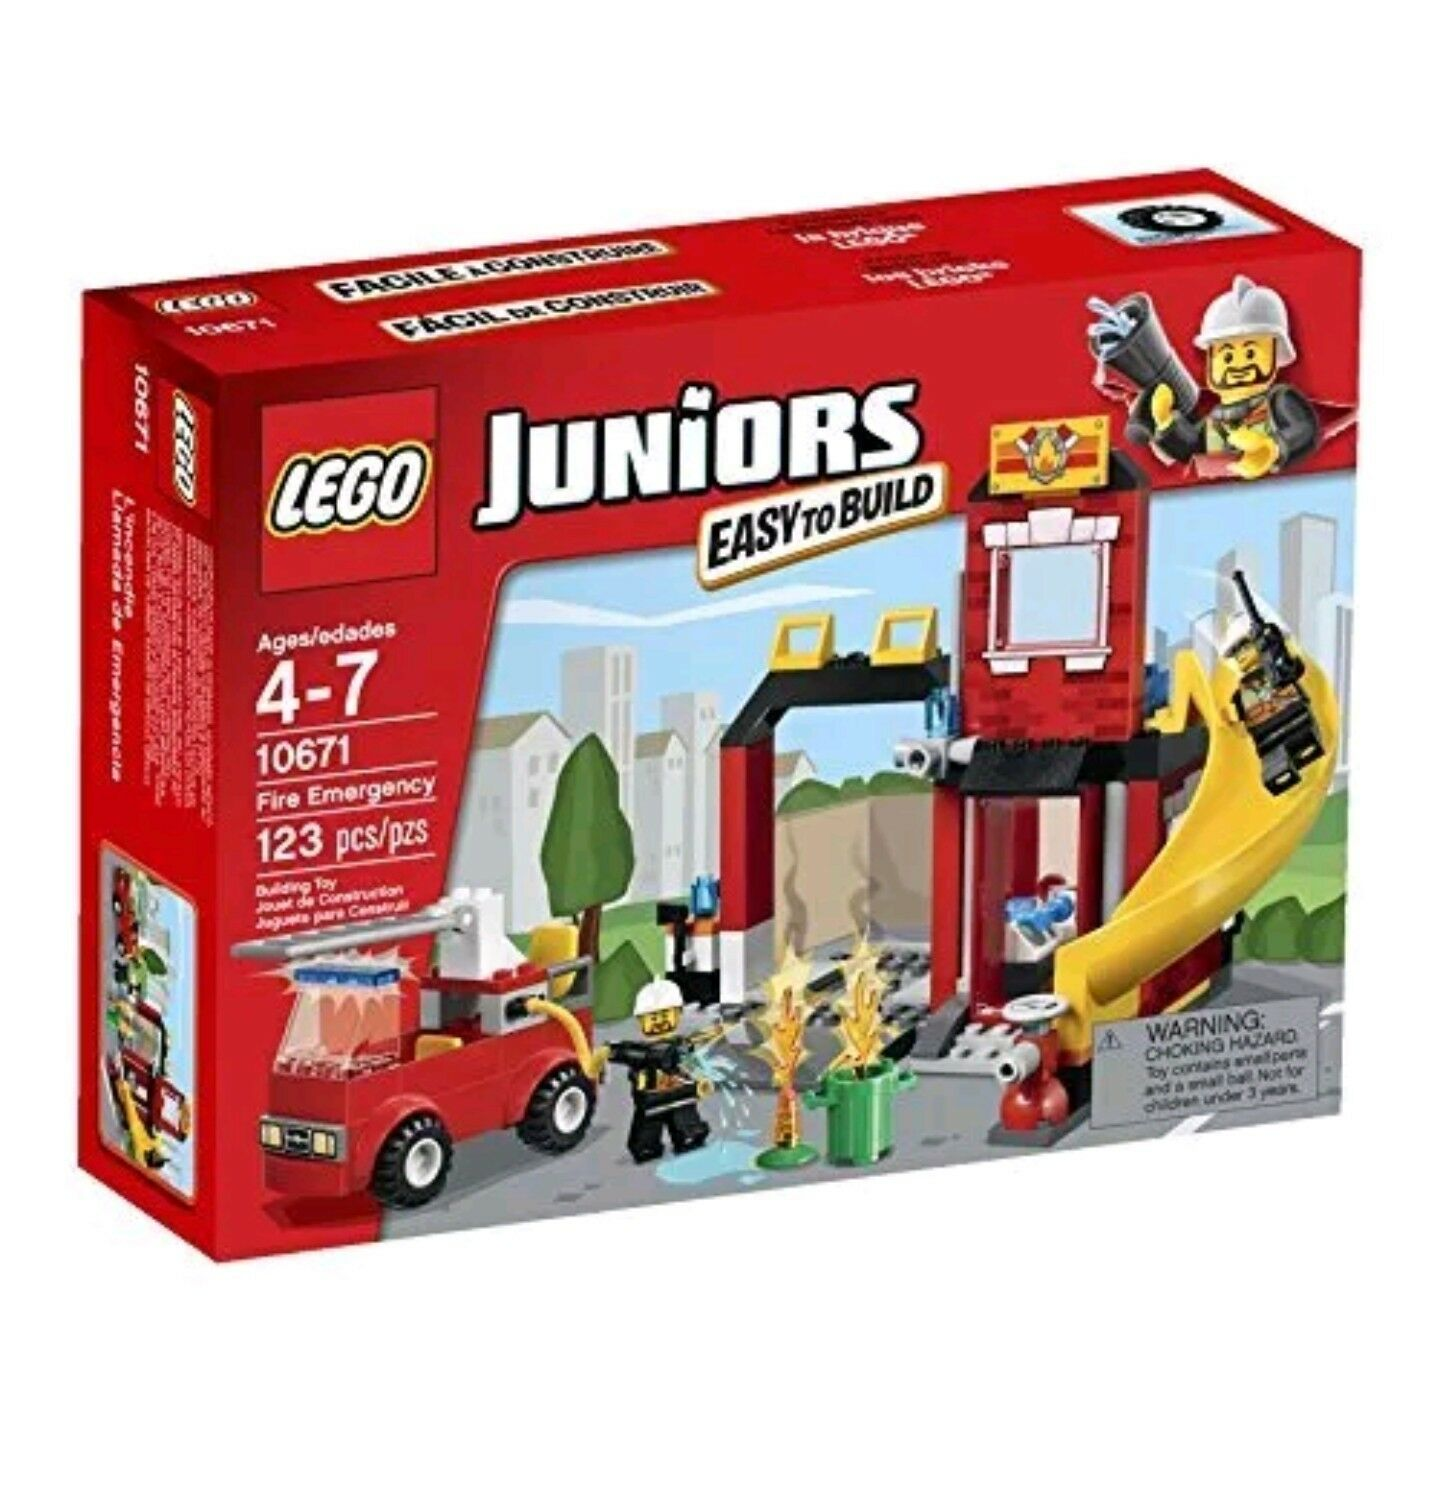 LEGO Juniors 10671 Fire Emergency - Rare - Retirosso NISB Free Shipping Great Gift